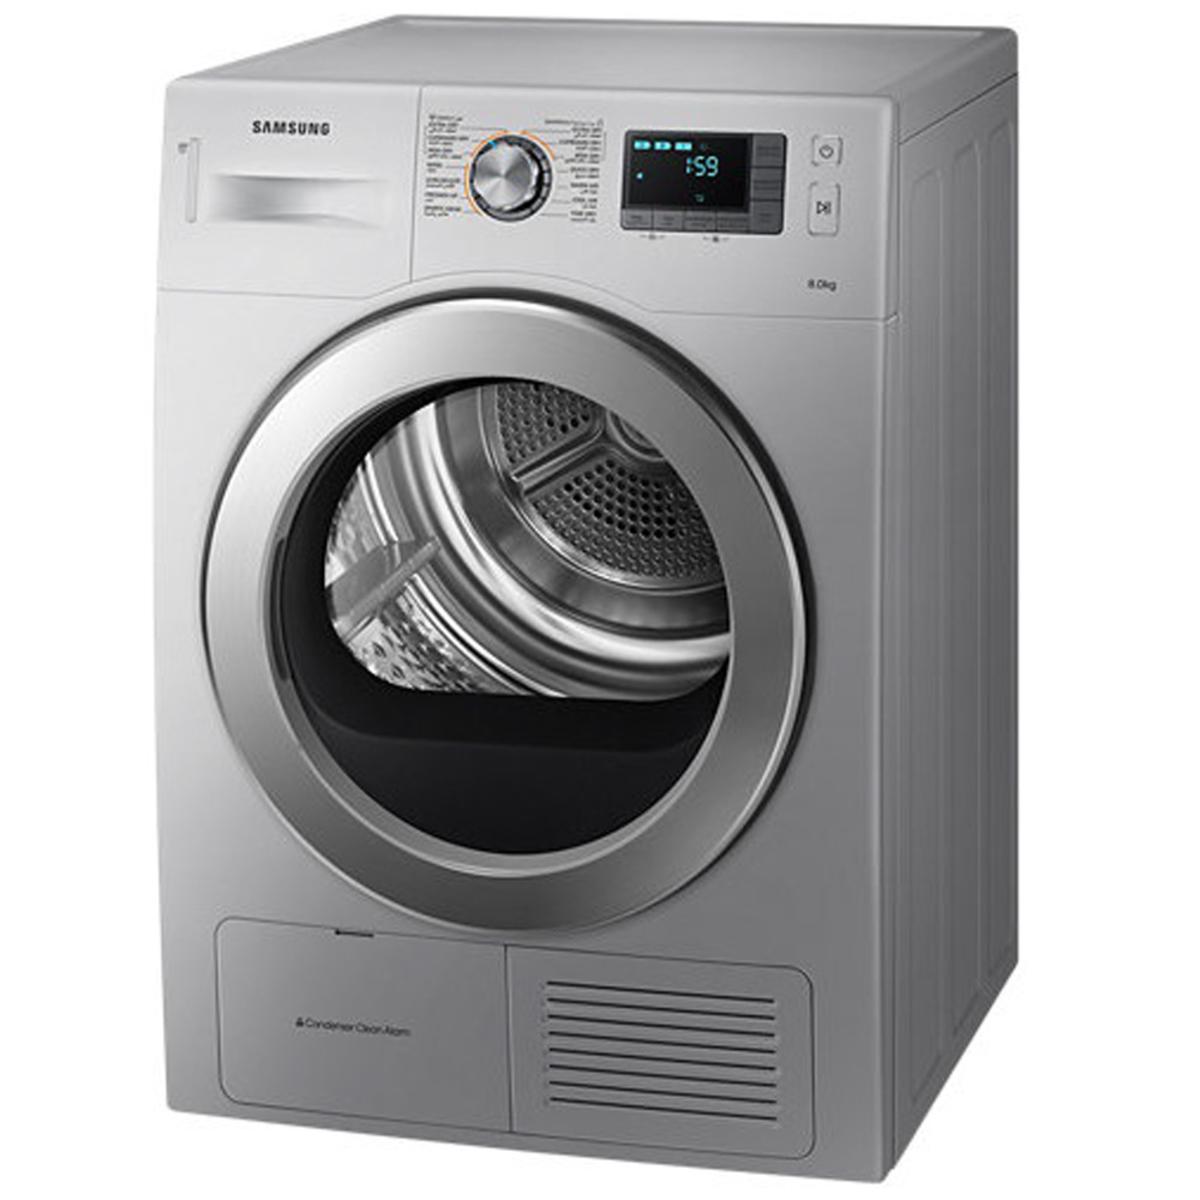 Buy Samsung Front Load Condenser Dryer DV80H4000CSNQ 8Kg - Dryer